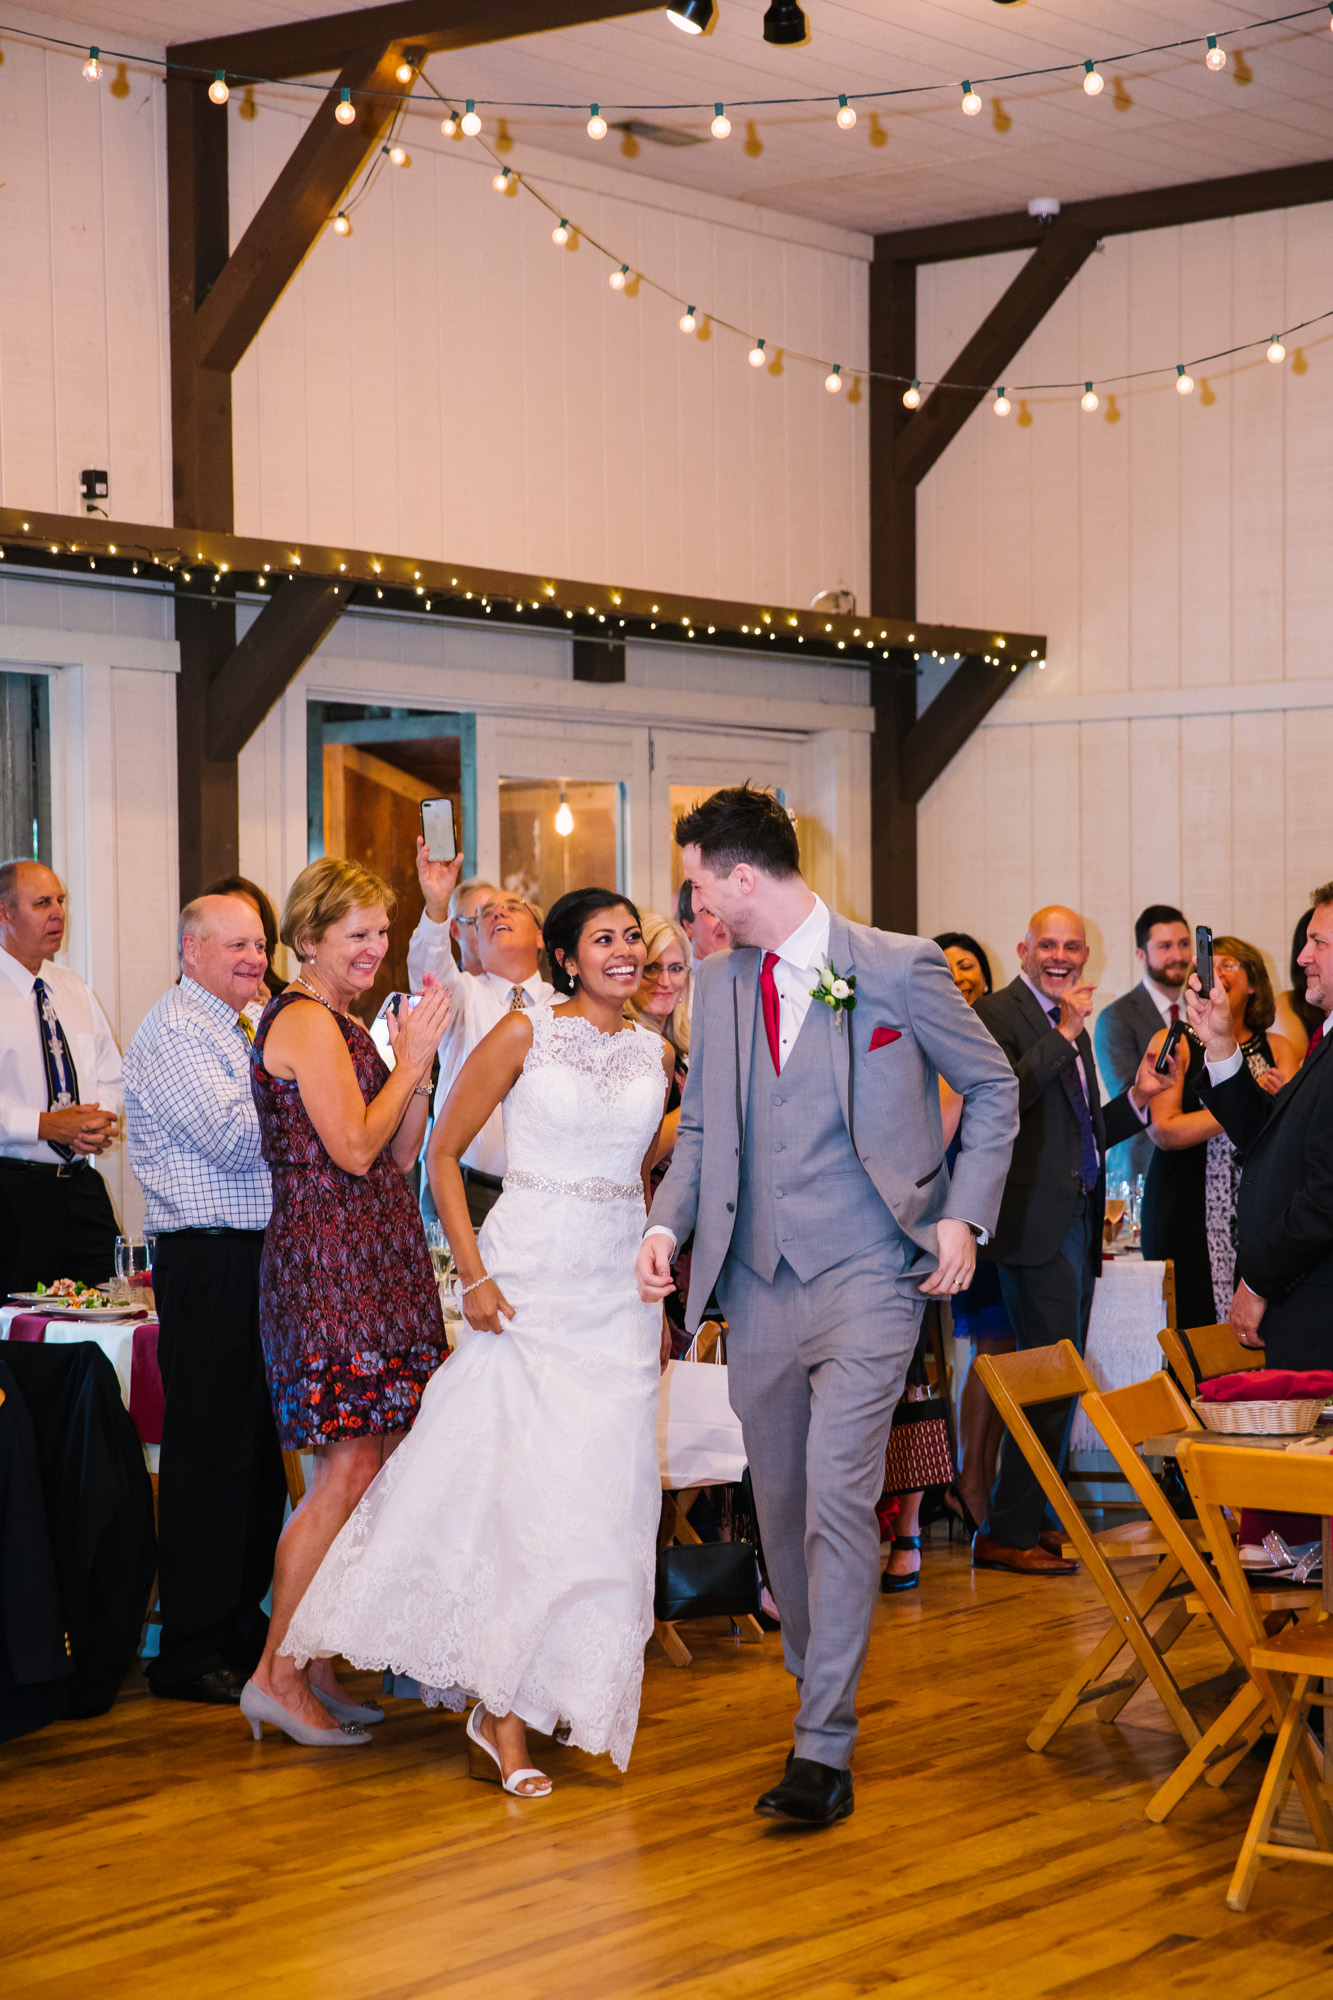 Waynesville NC Wedding Photography | Bride and Groom Reception Entrance